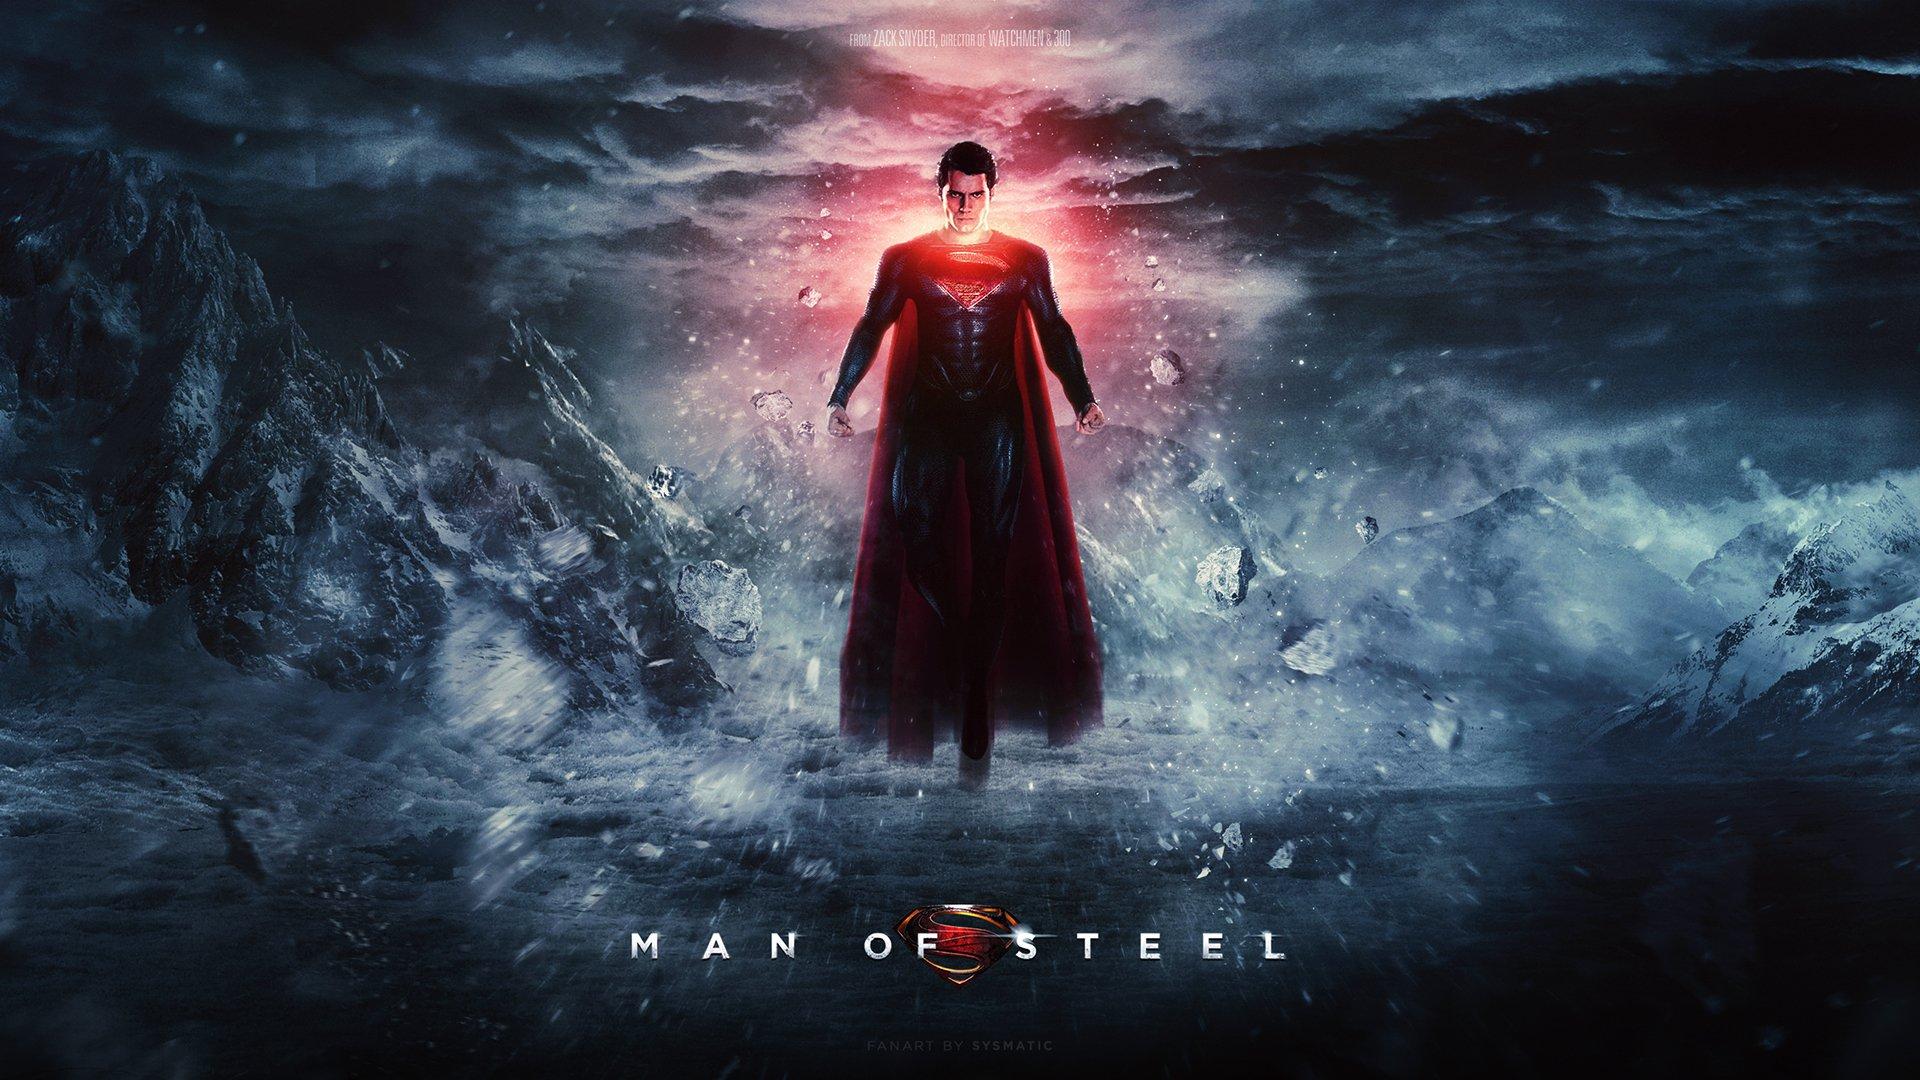 Wallpaper Man of steel, a super man movie